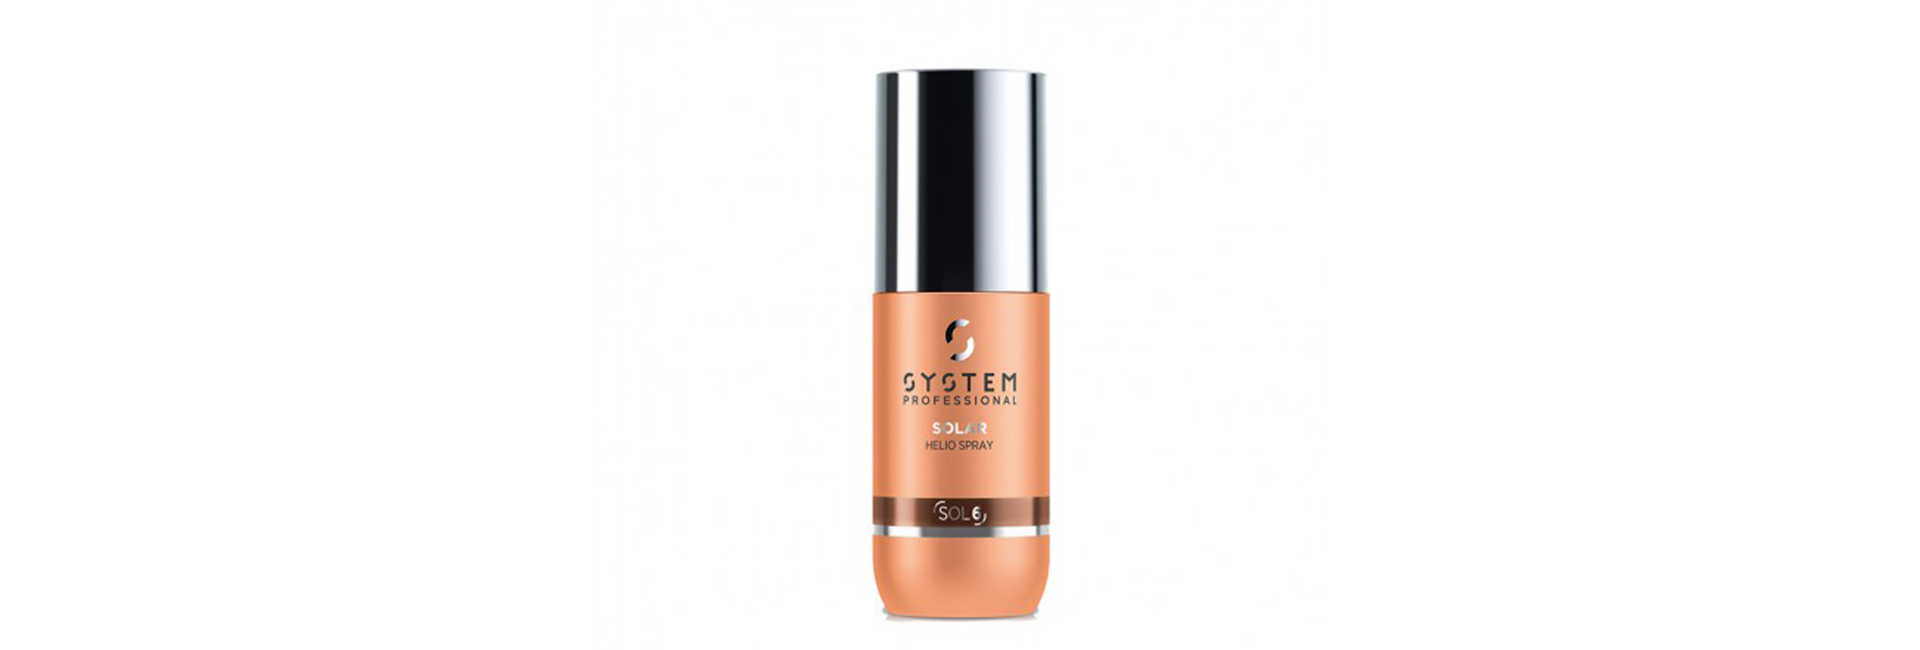 helio-spray-solar-system-professional-blog-beaute-soin-parfum-homme